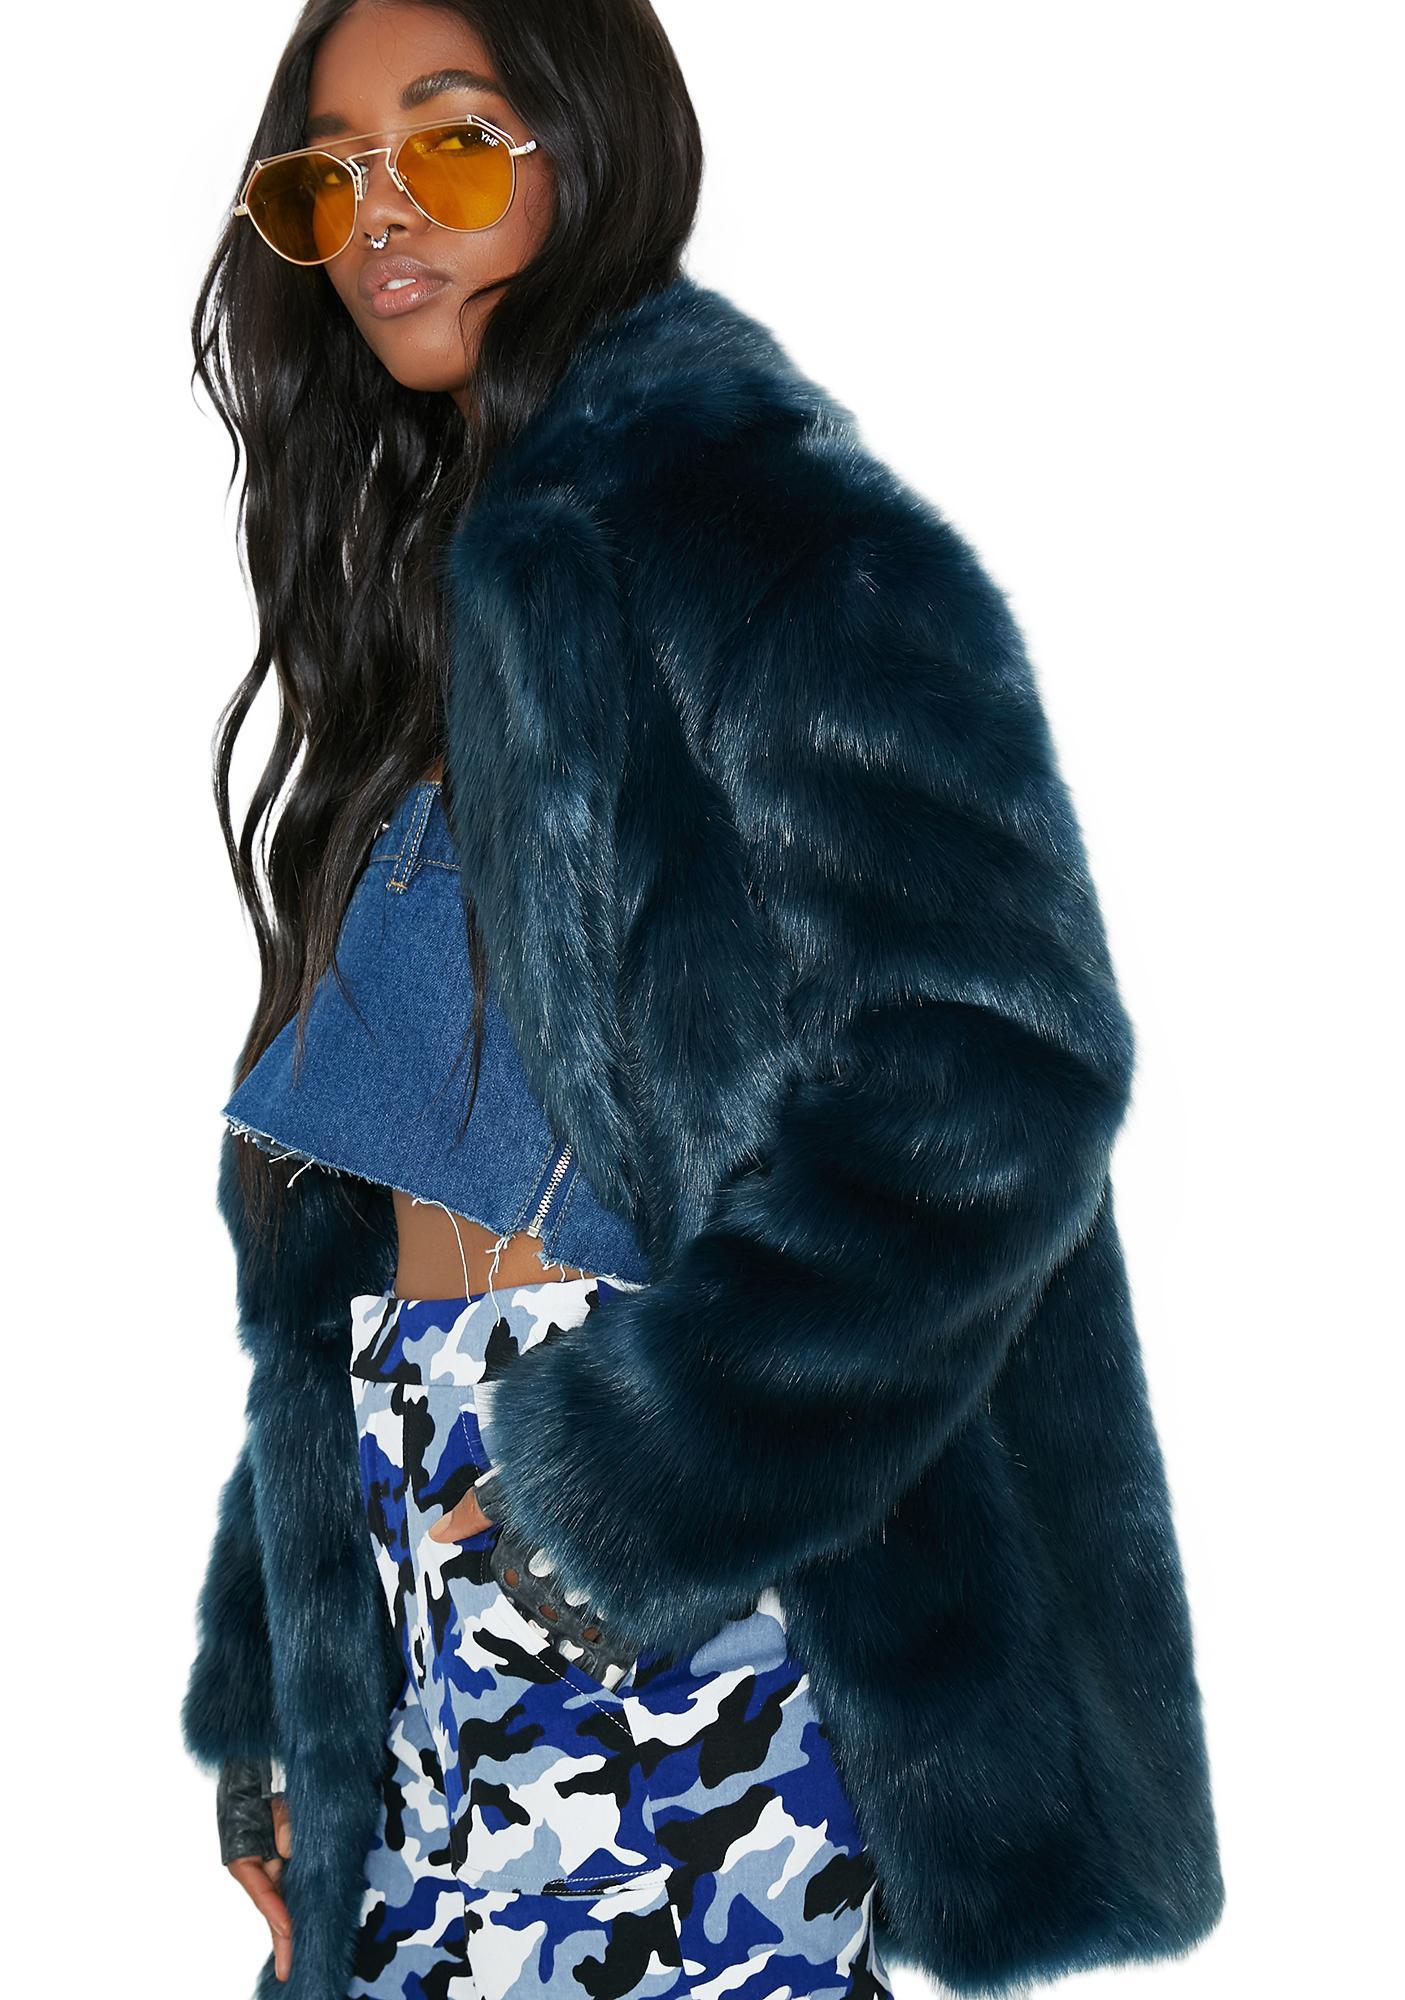 Jakke Teal Heather Coat